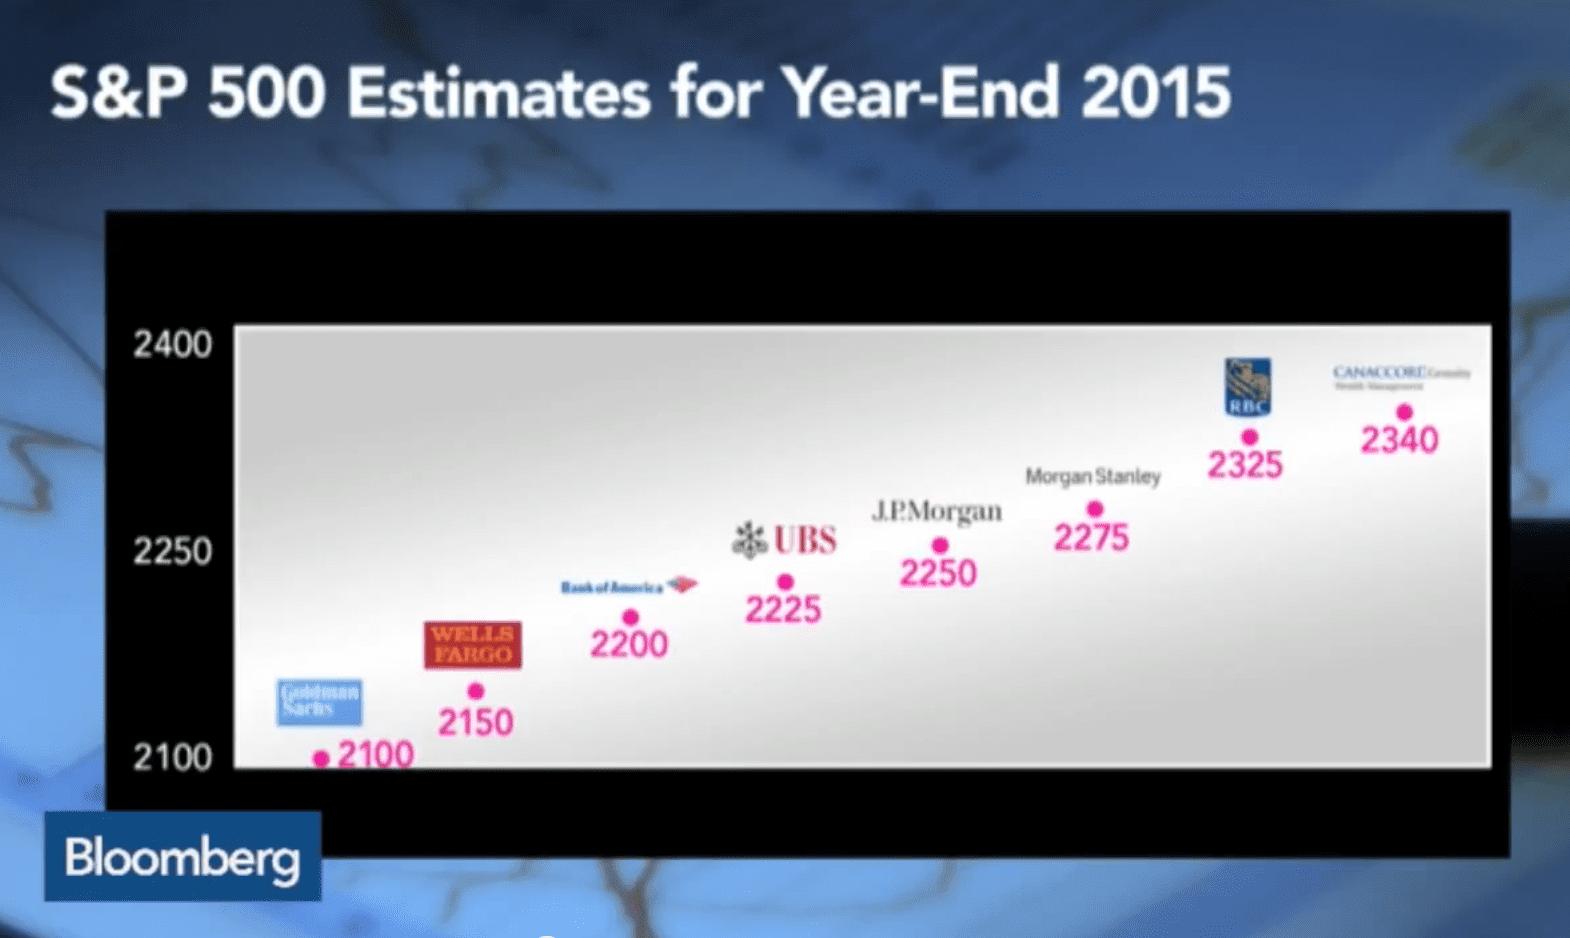 s&p 2015 analyst estimates